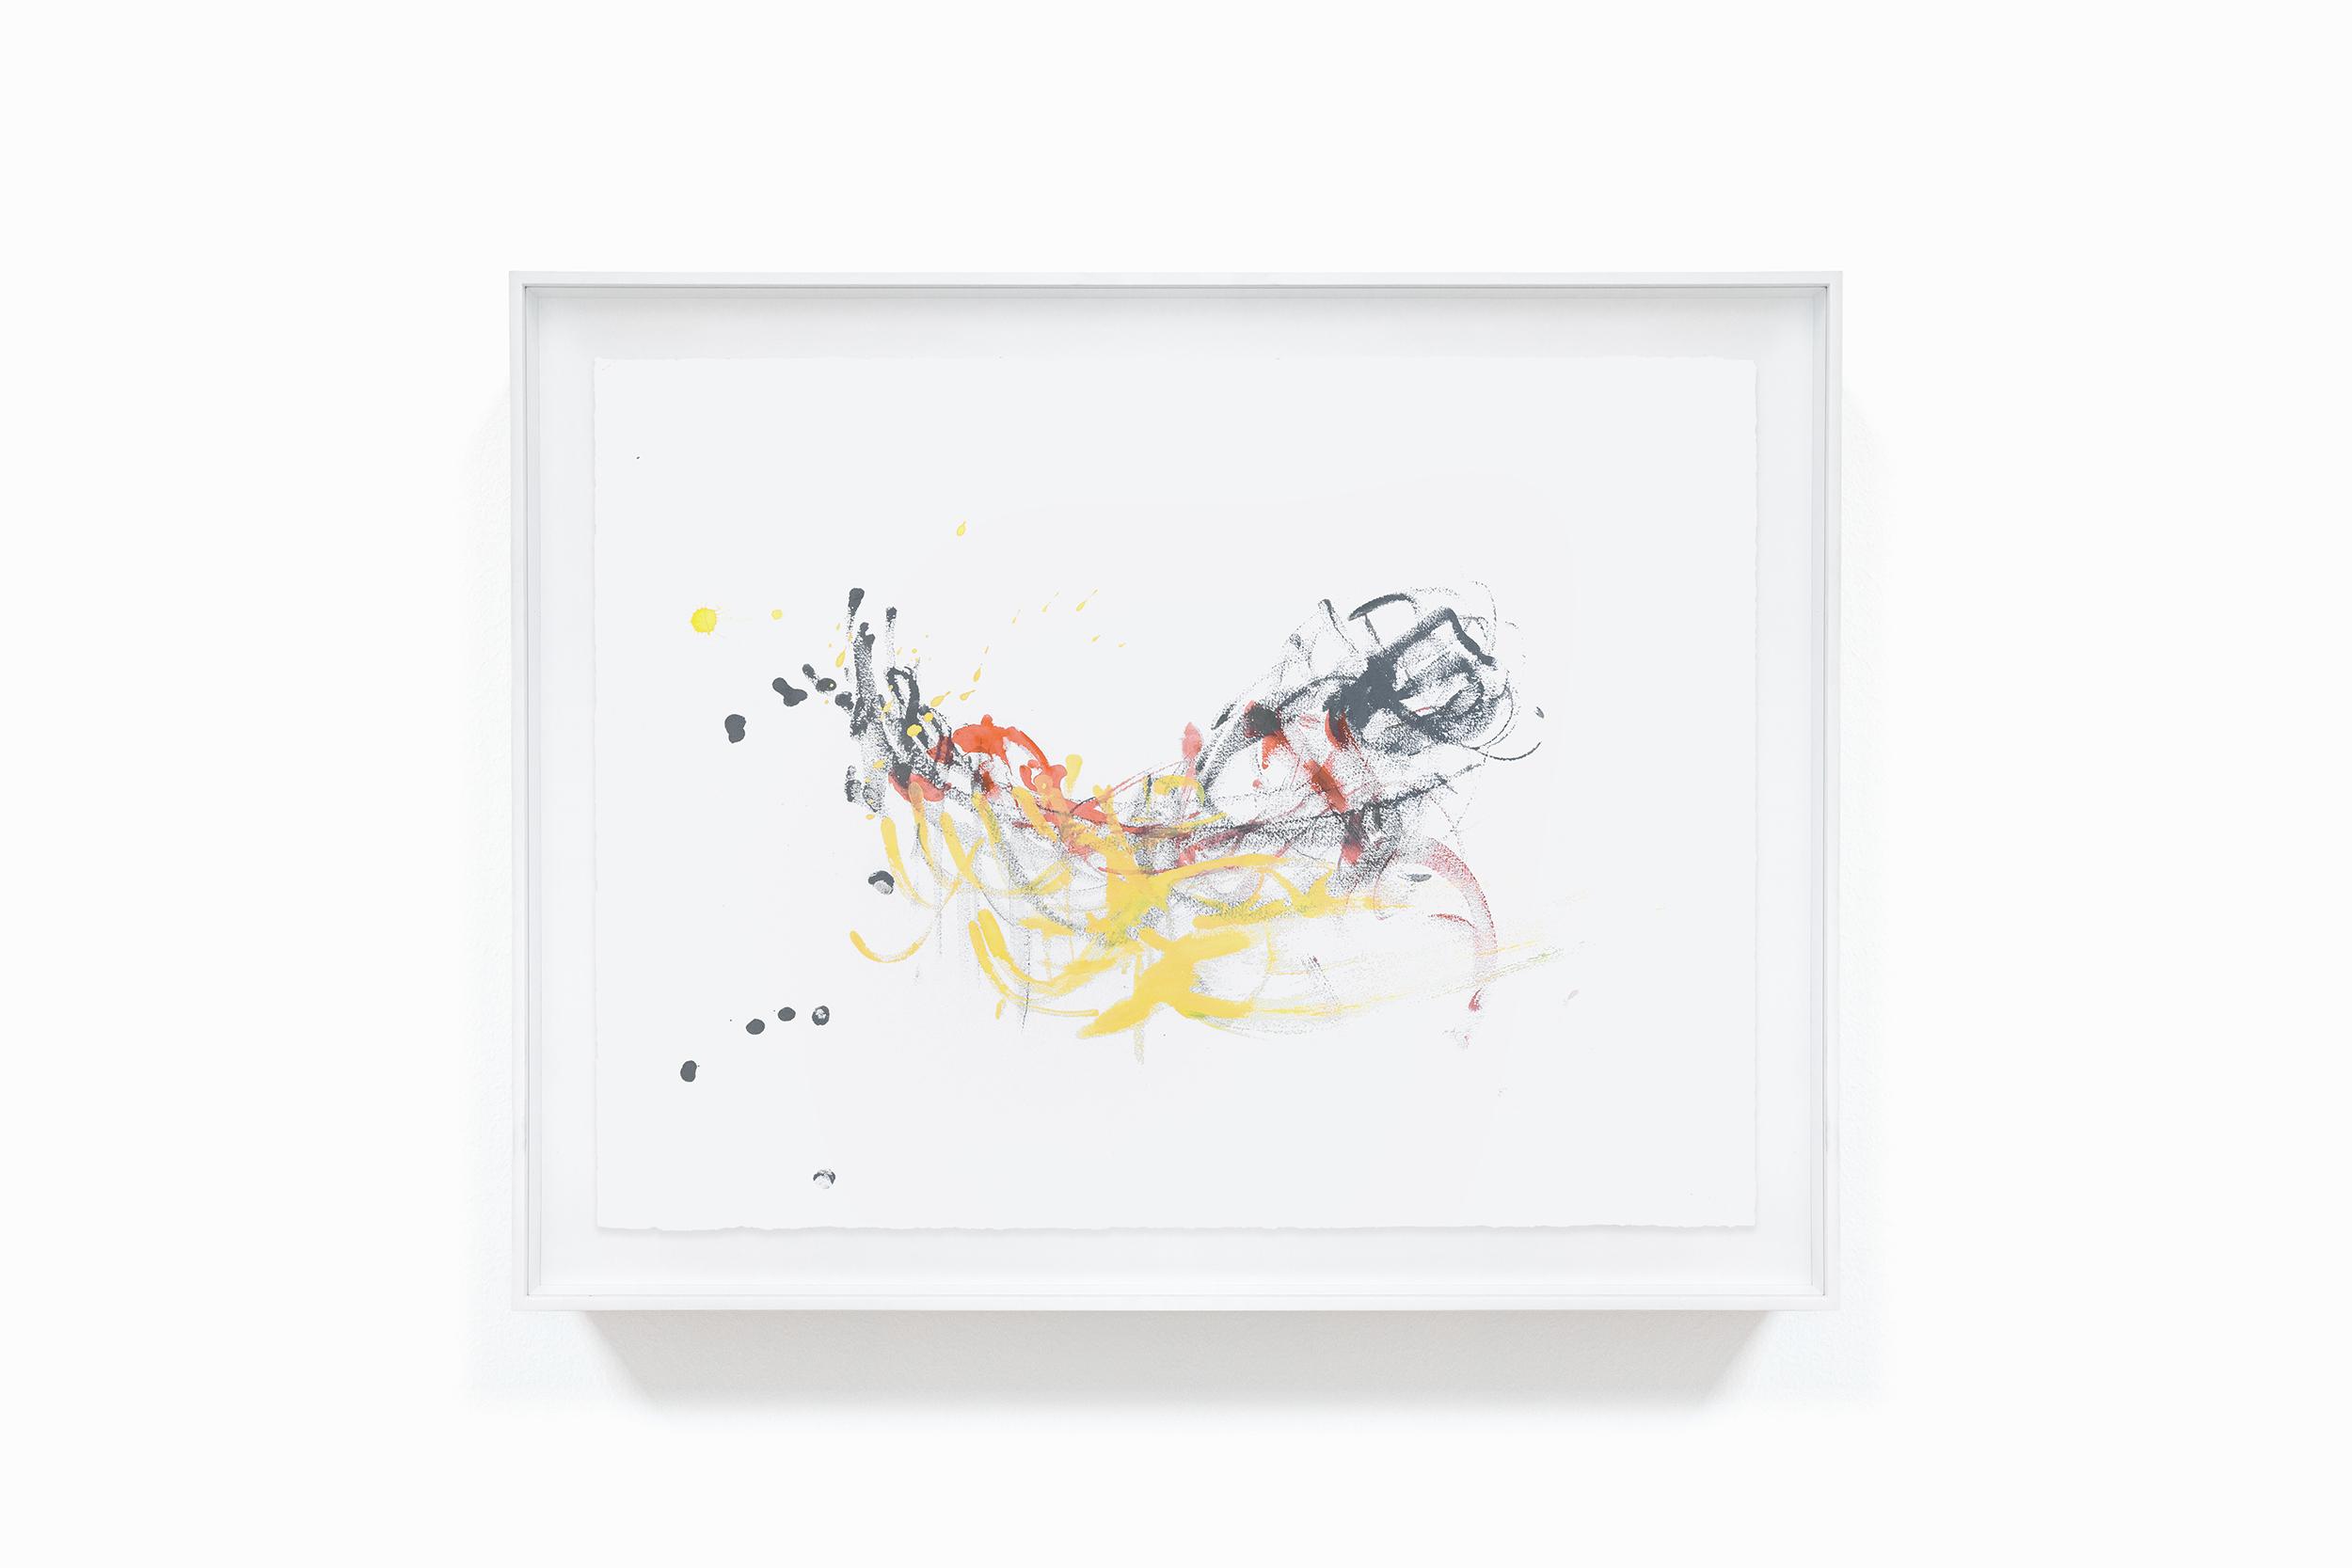 093C Andre Gigante Pintura Painting bonjourmolotov La.jpg